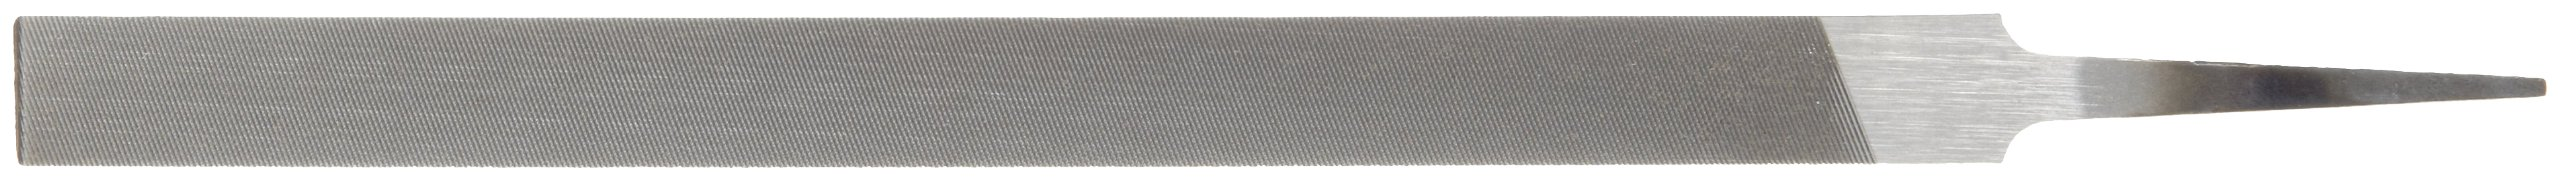 8 Length Double Cut Extra Narrow Nicholson Pillar File #0 Coarseness Swiss Pattern Rectangular